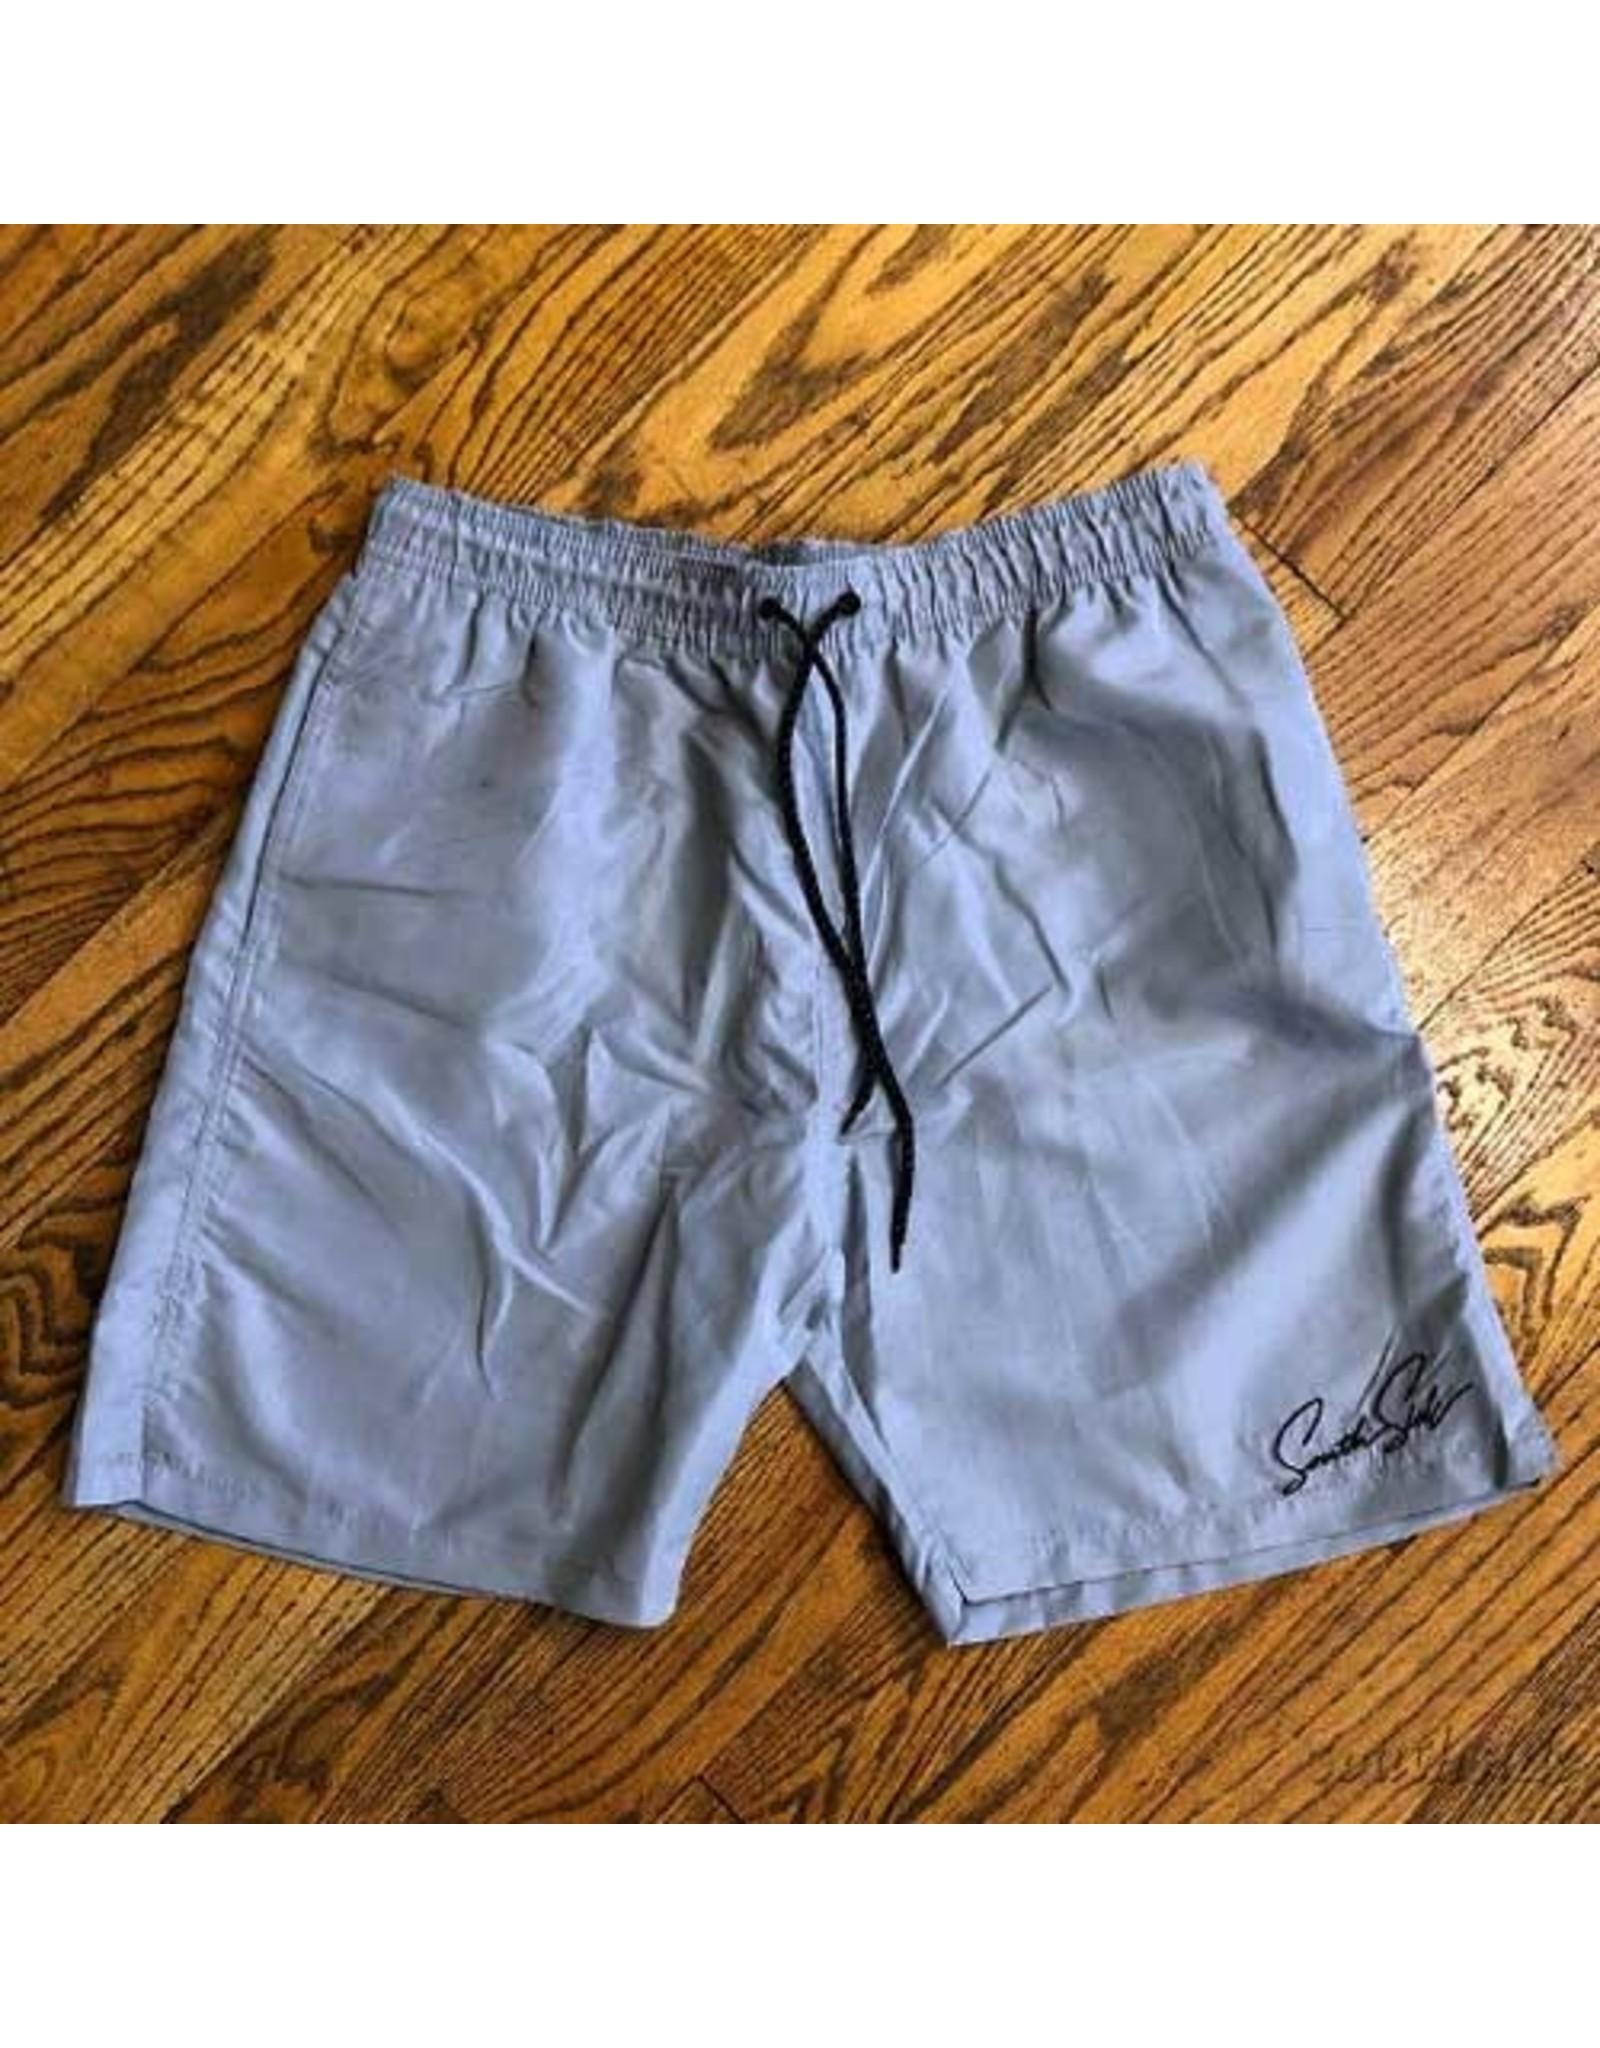 Southside Southside Shorts Light Gray